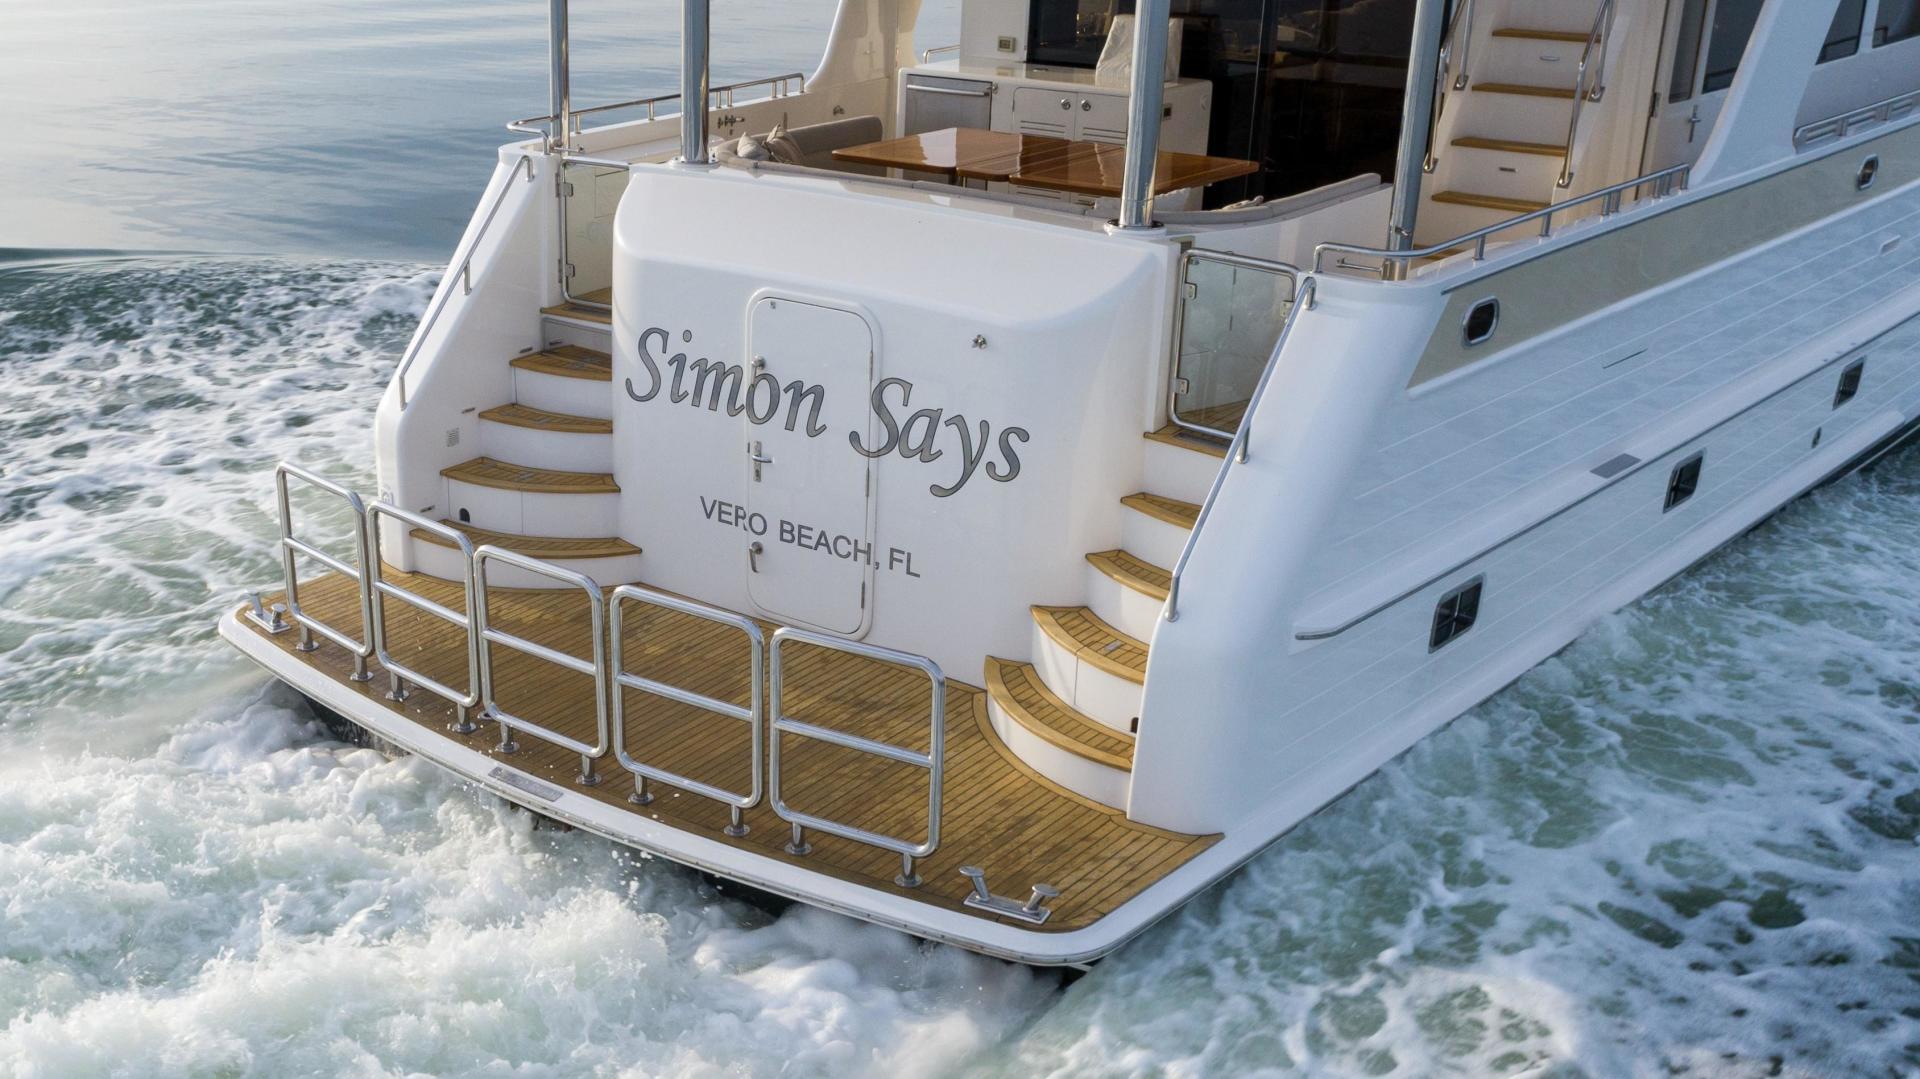 Outer Reef Yachts-860 DBMY 2017-Simon Says Vero Beach-Florida-United States-1488227 | Thumbnail